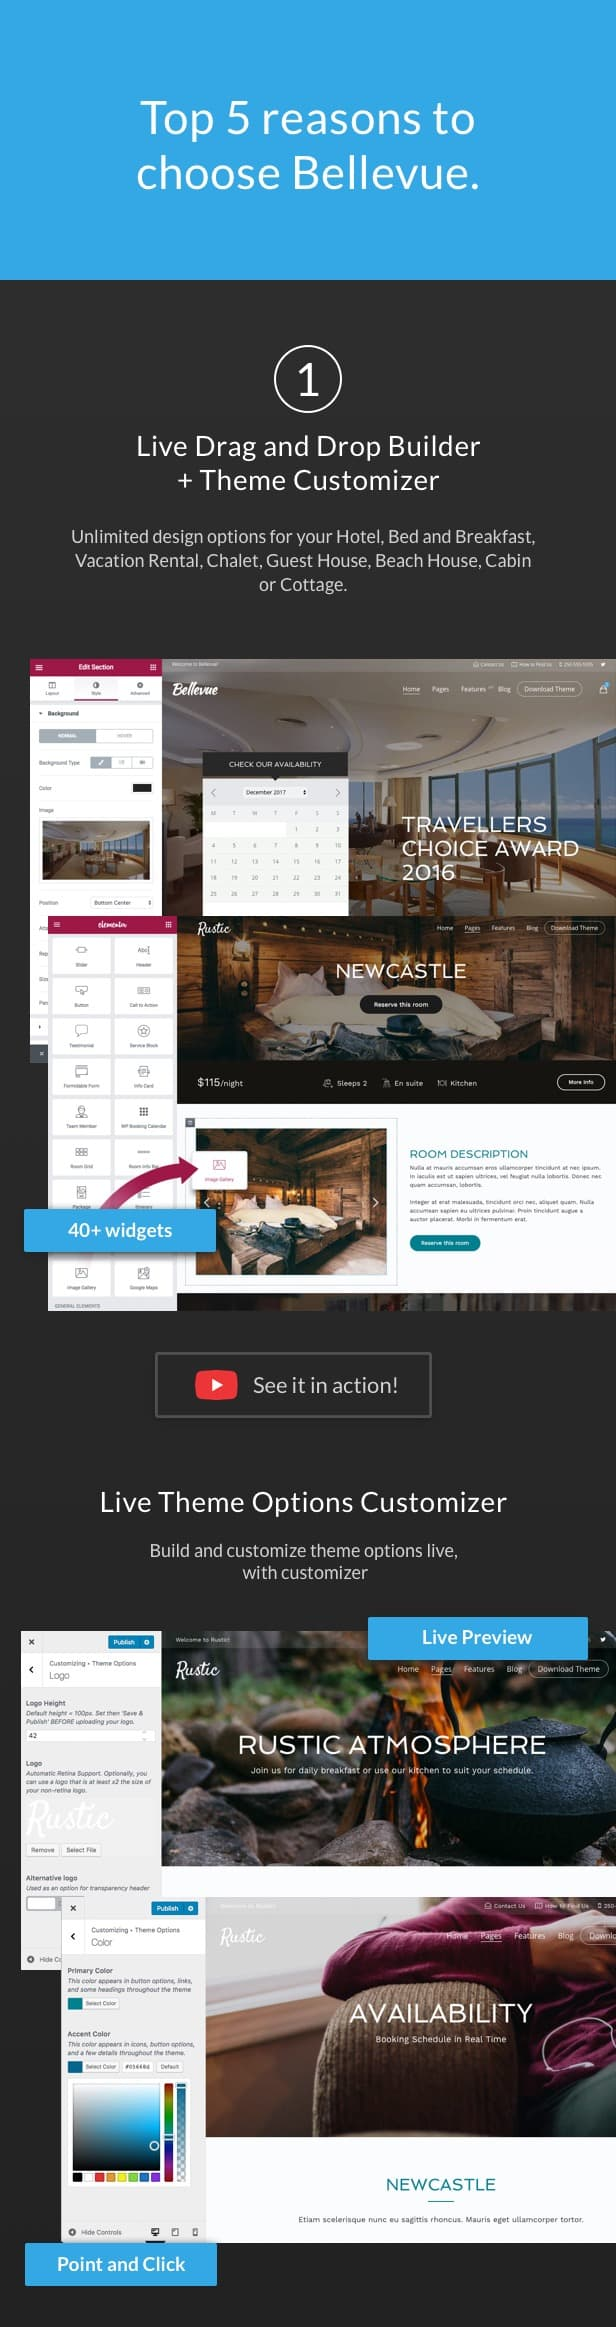 01 bellevue hotel bnb wordpress theme - Hotel + Bed and Breakfast Booking Calendar Theme | Bellevue